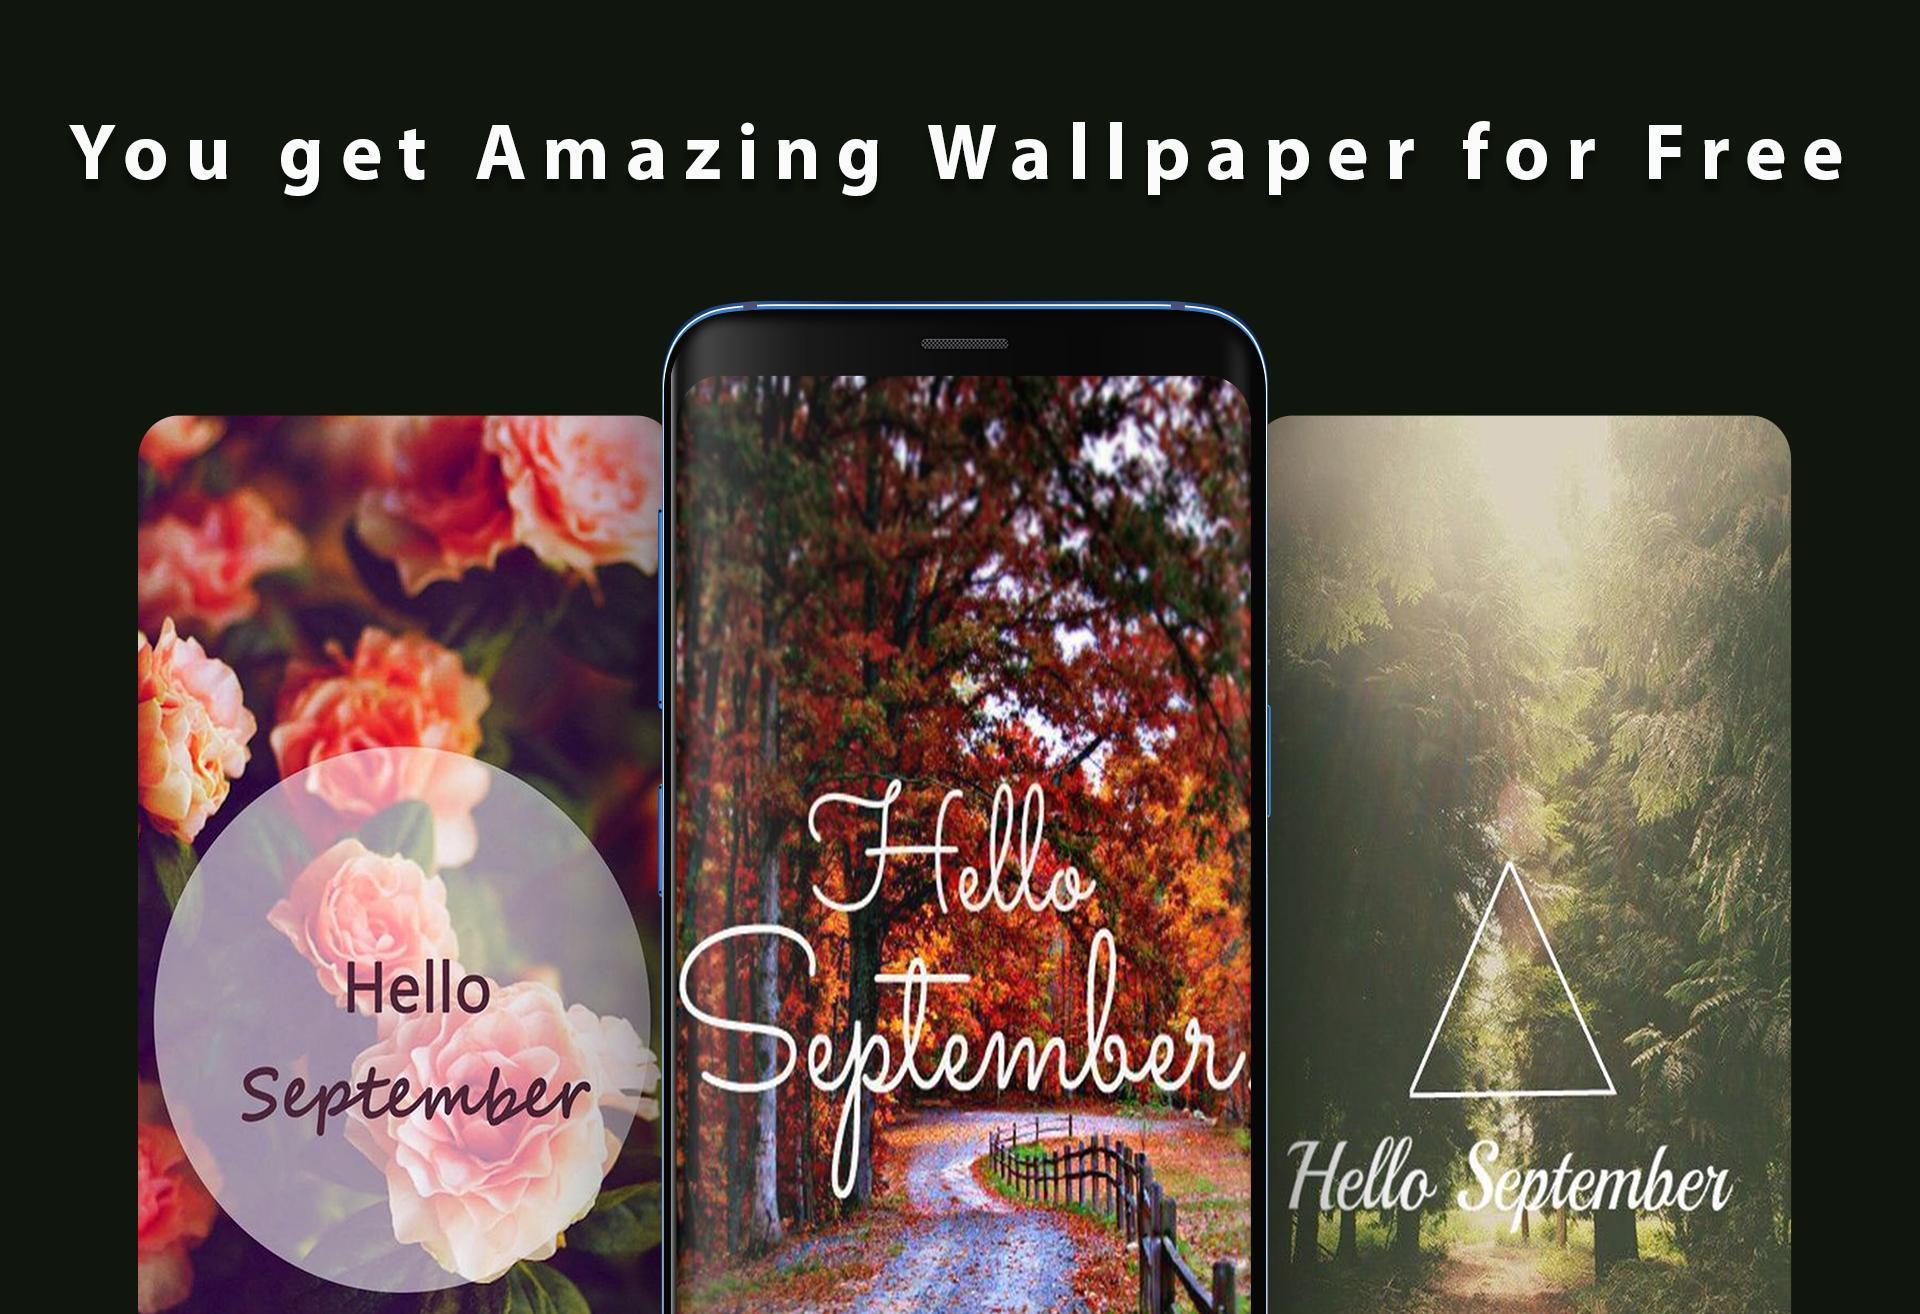 September Wallpaper For Android Apk Download